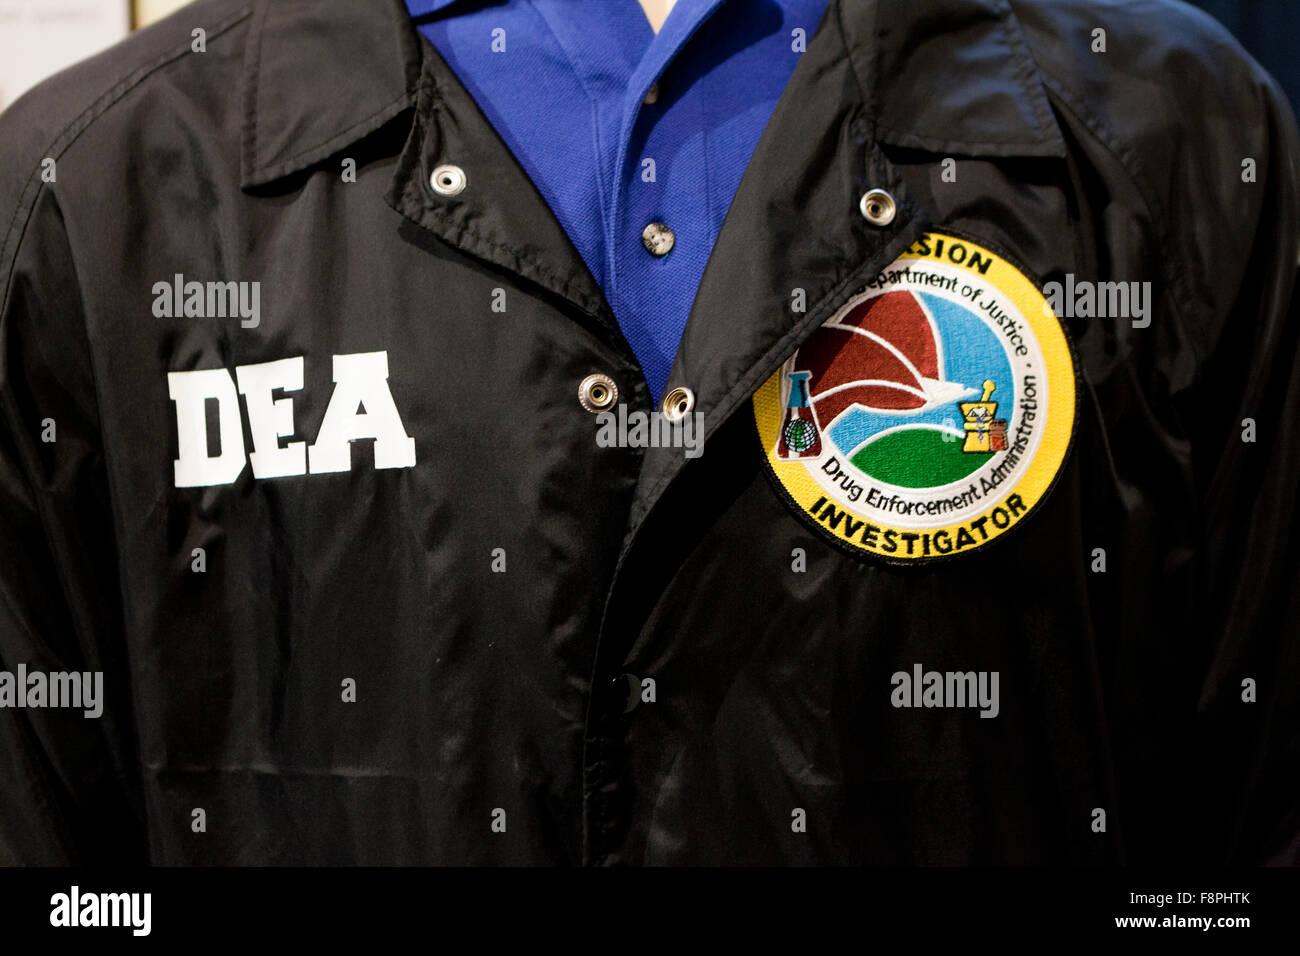 Drug Enforcement Agency (DEA) identification jacket - USA - Stock Image